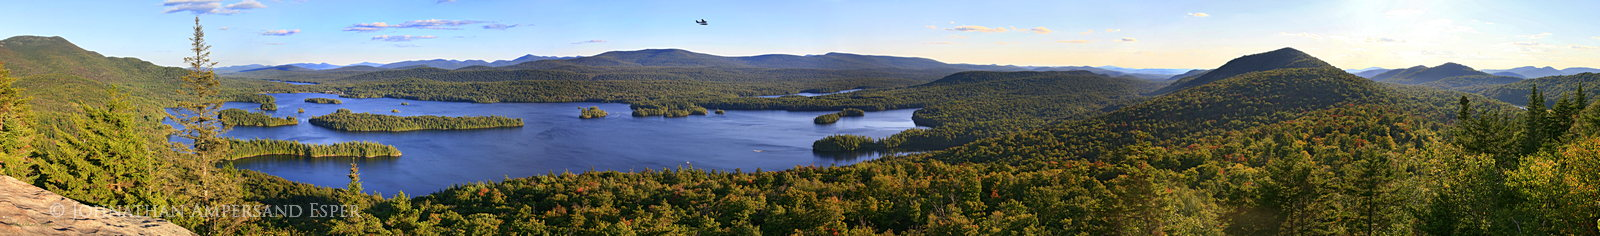 Blue Mountain Lake,Castle Rock,Blue Mountain,floatplane,summer,panorama,Blue Mt Lake,Blue Mountain Lake Castle Rock Floa, photo